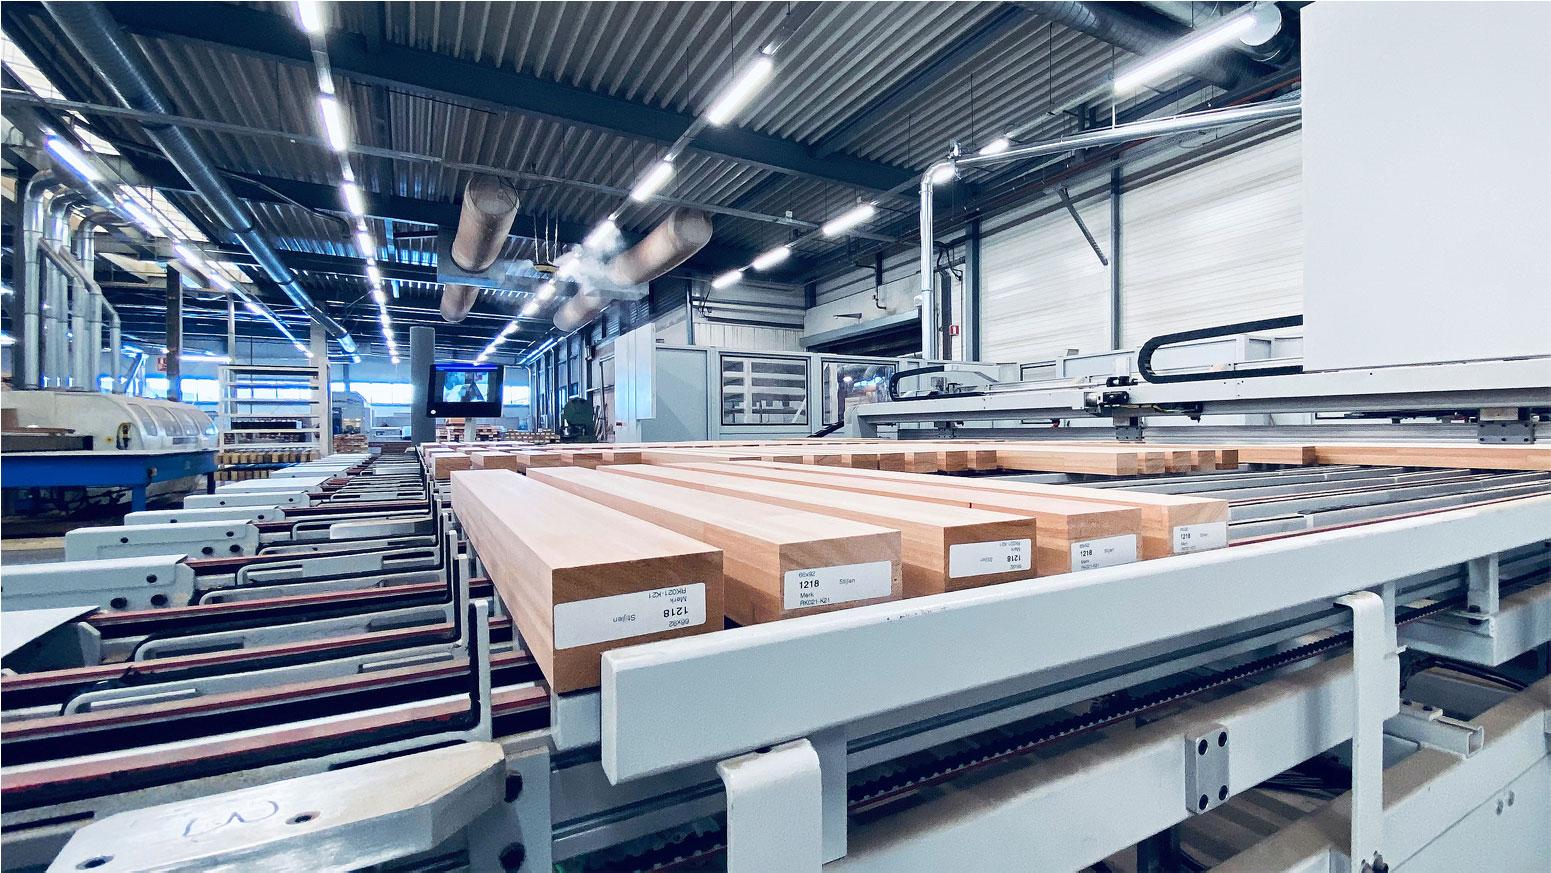 Werkplaats Timmerfabriek Jongbloed Winschoten B.V.